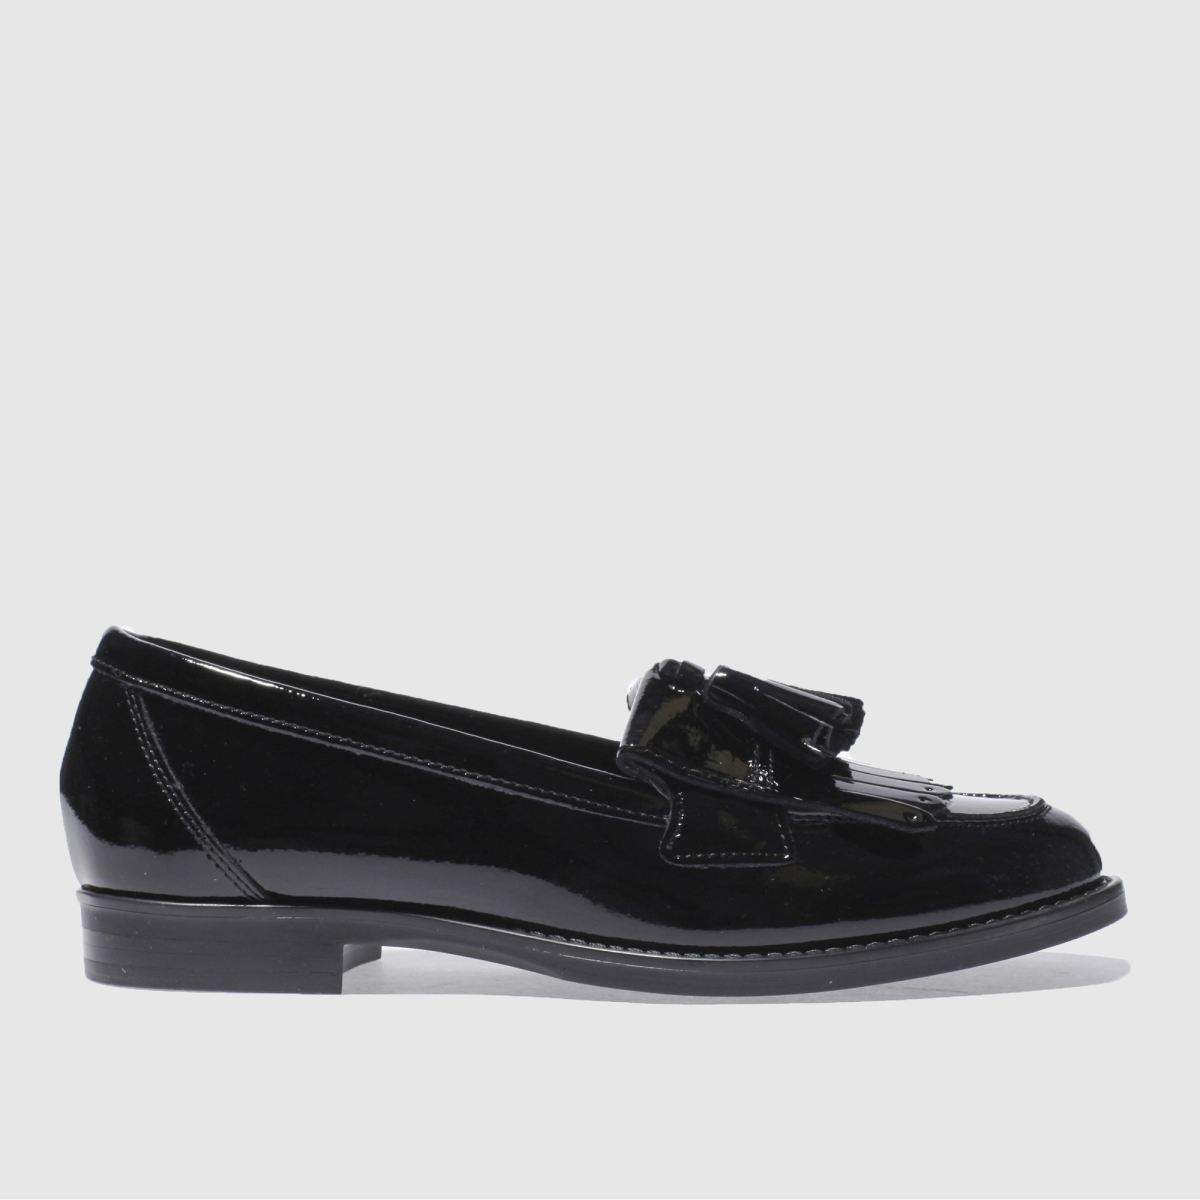 Schuh Black Compass Flat Shoes